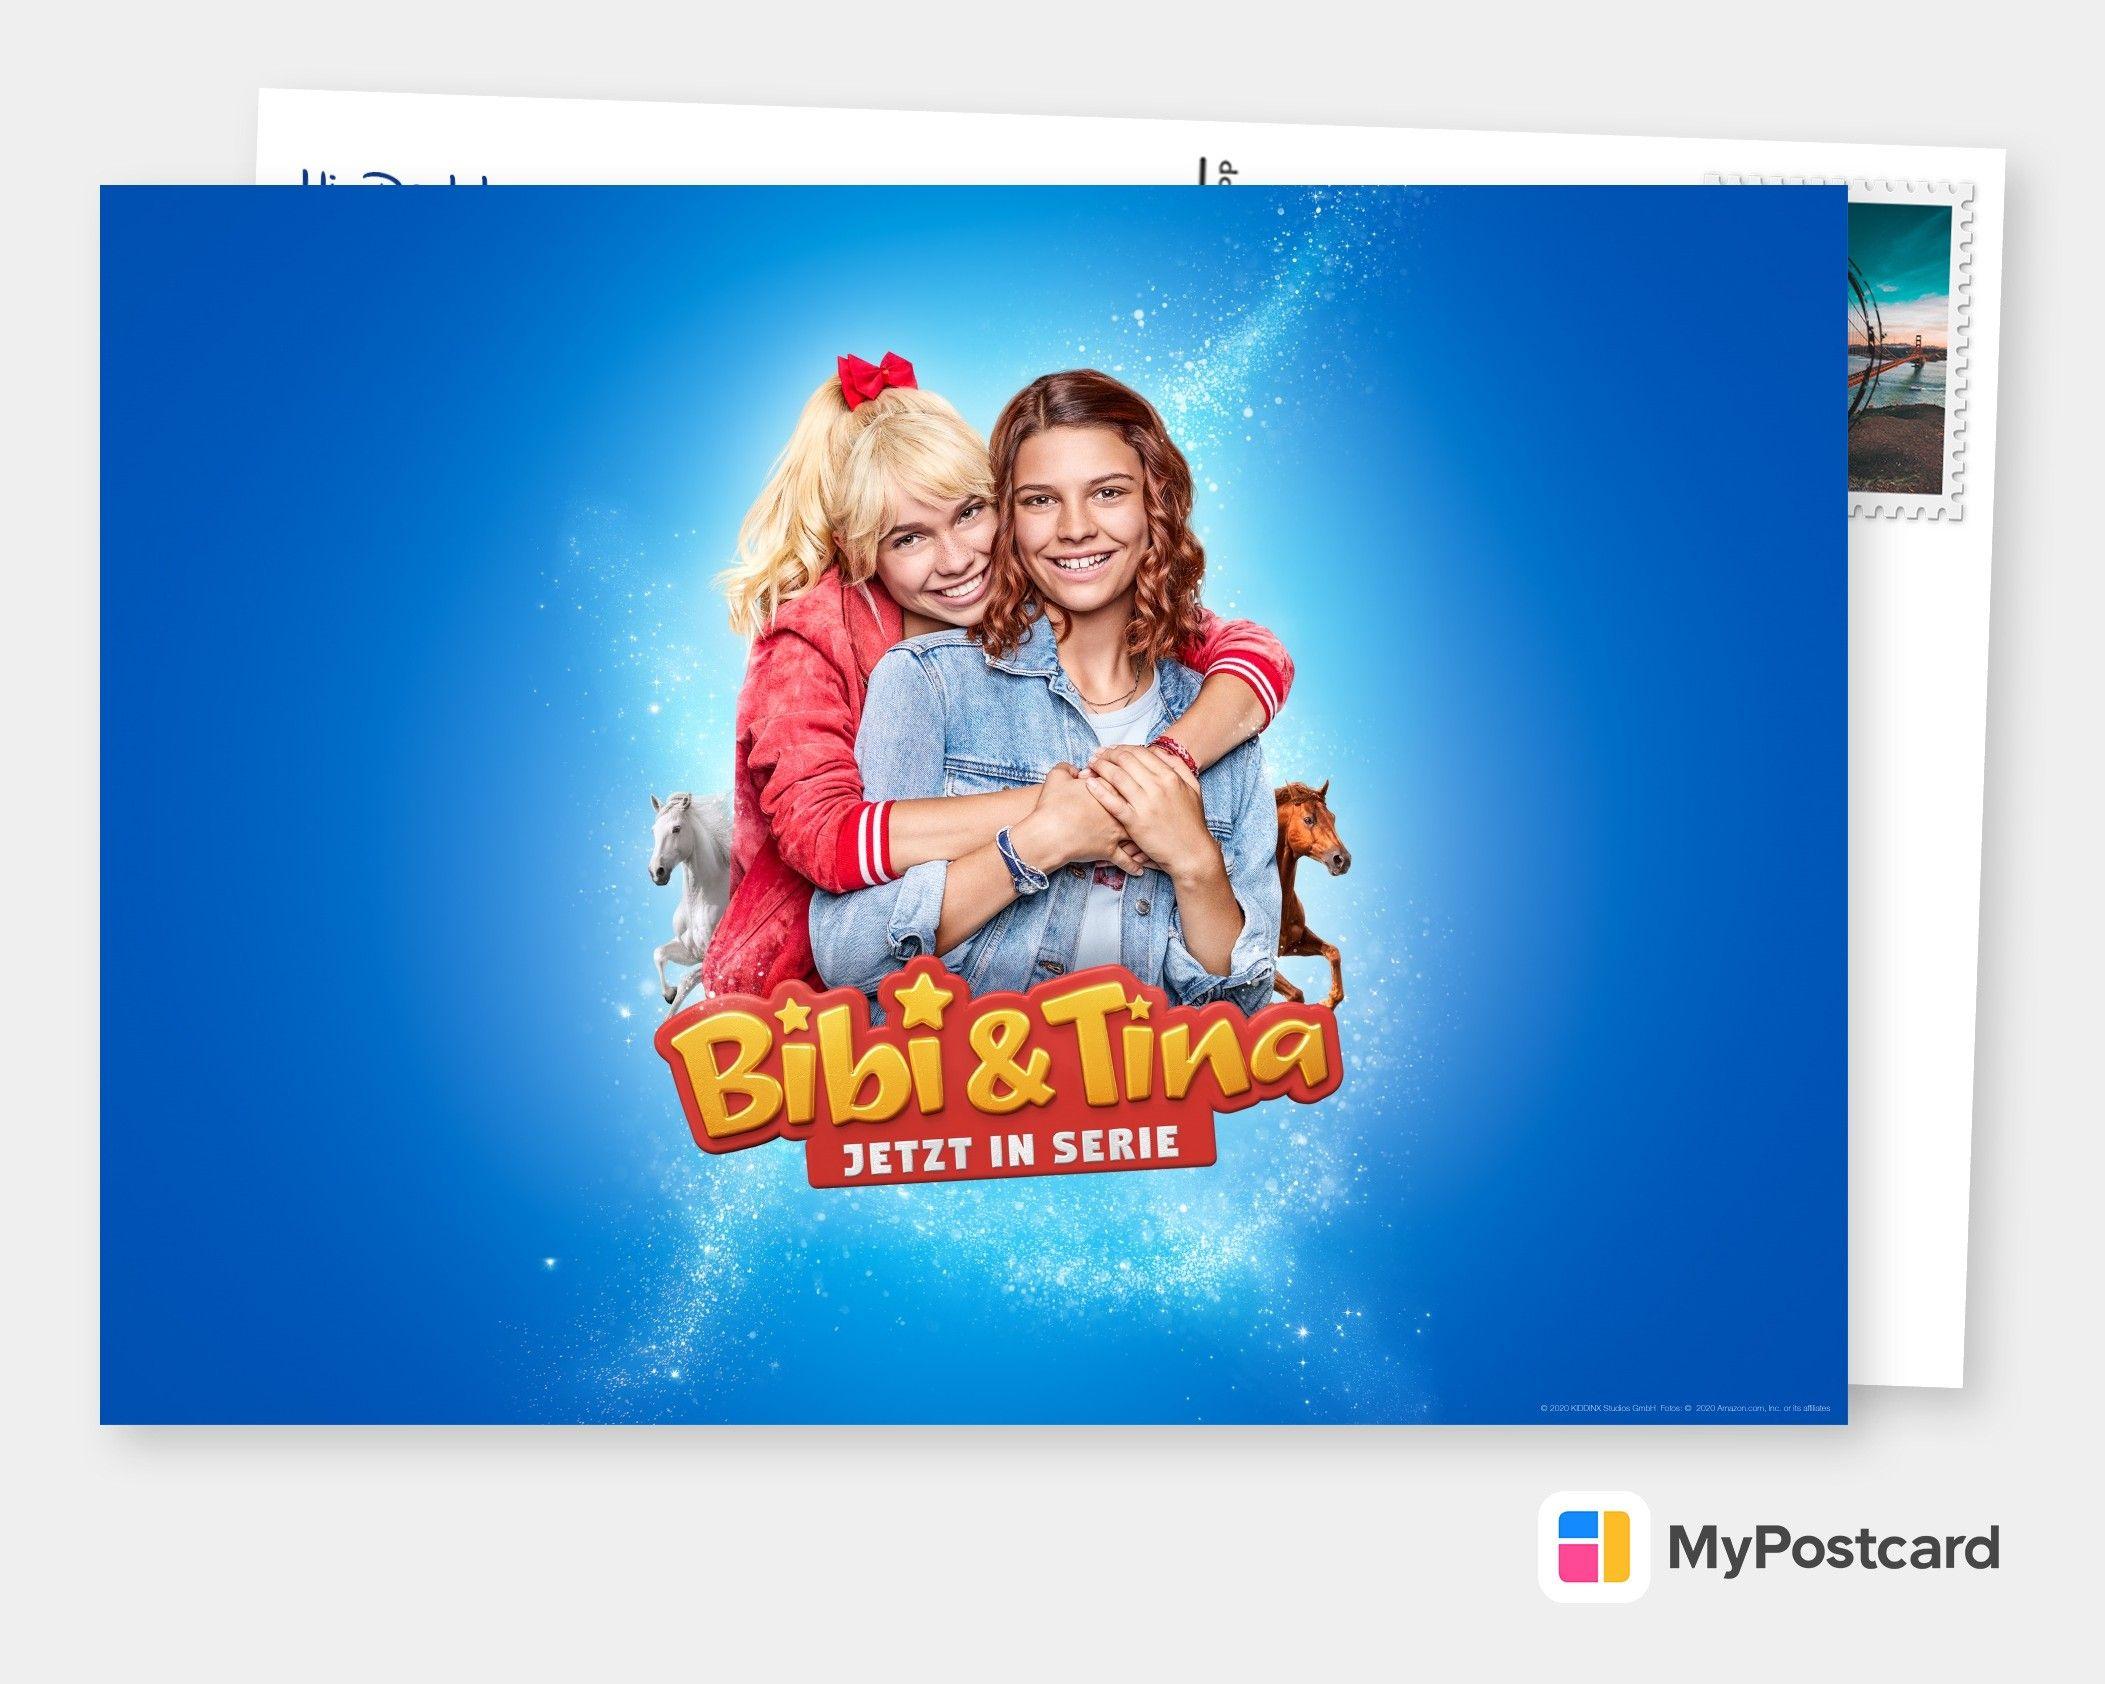 Bibi Tina Jetzt In Serie Film Musik Karten Echte Postkarten Online Versenden Filme Postkarten Karten